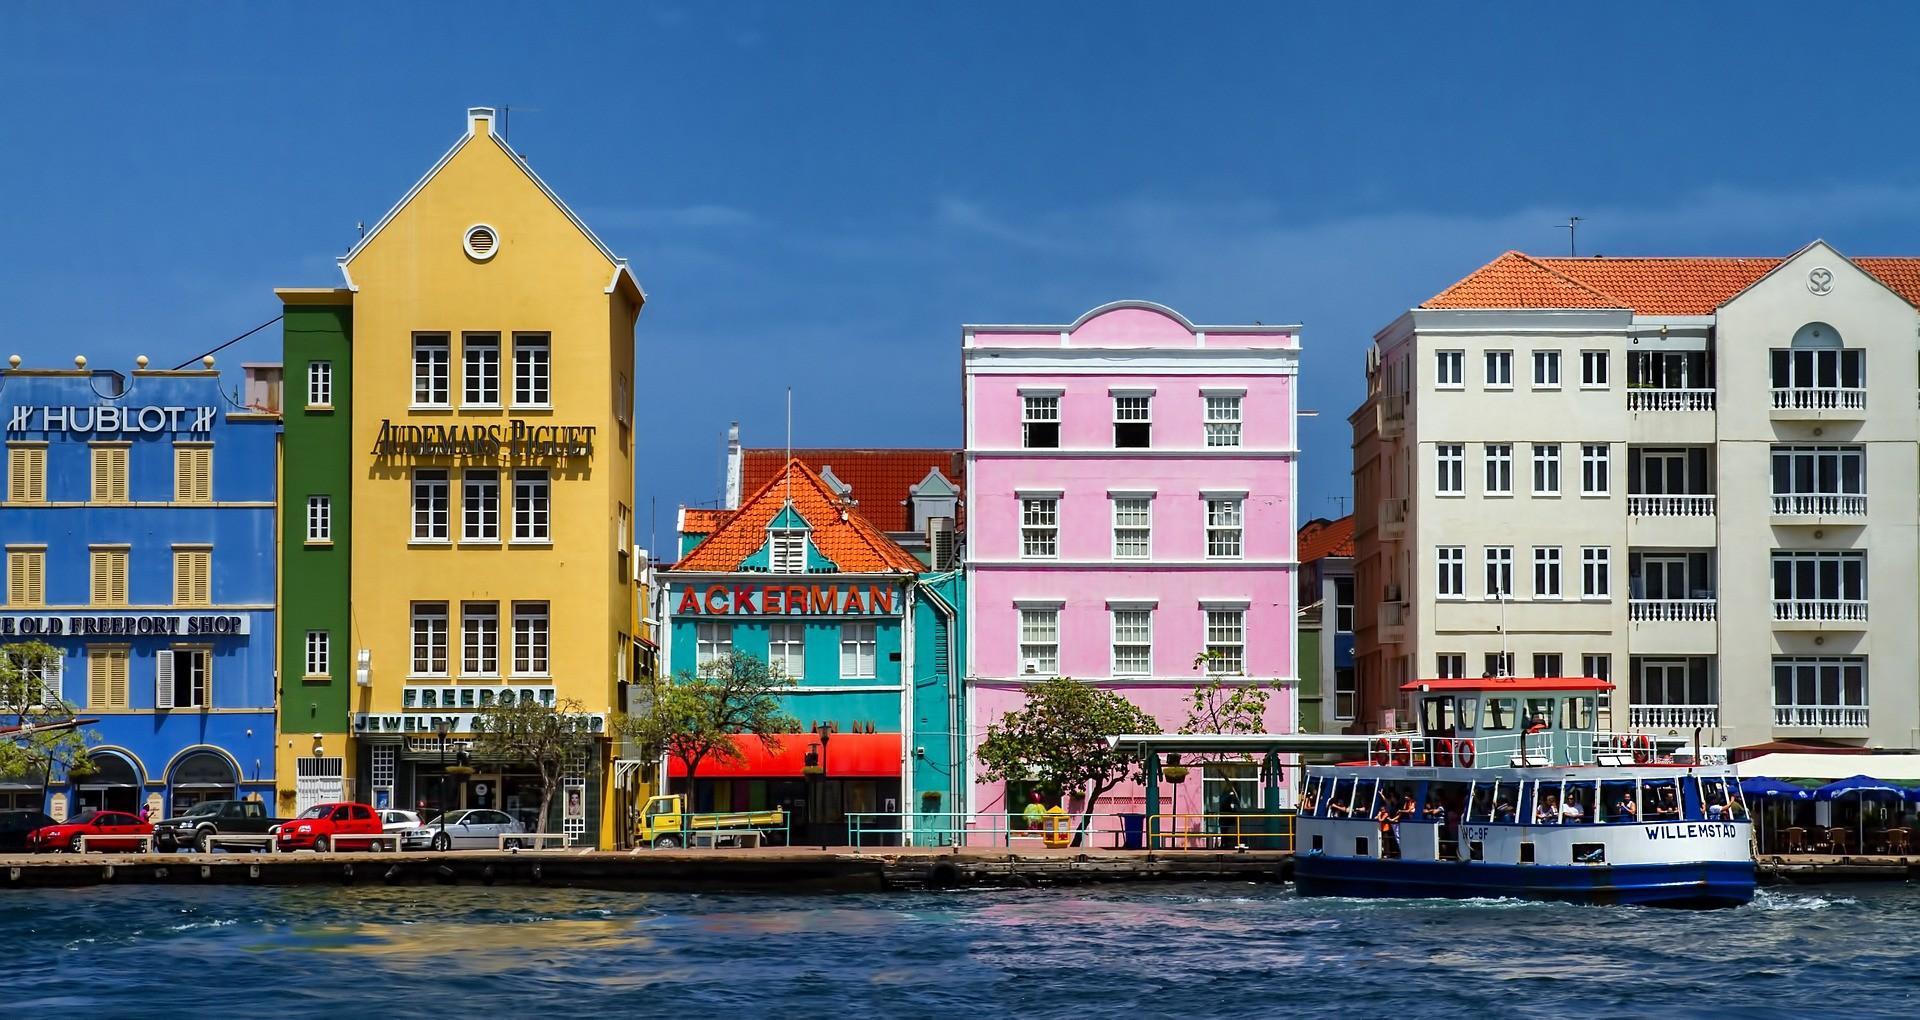 Zaterdag 01 april 2017: Curaçao dag bij JoHo in Den Haag